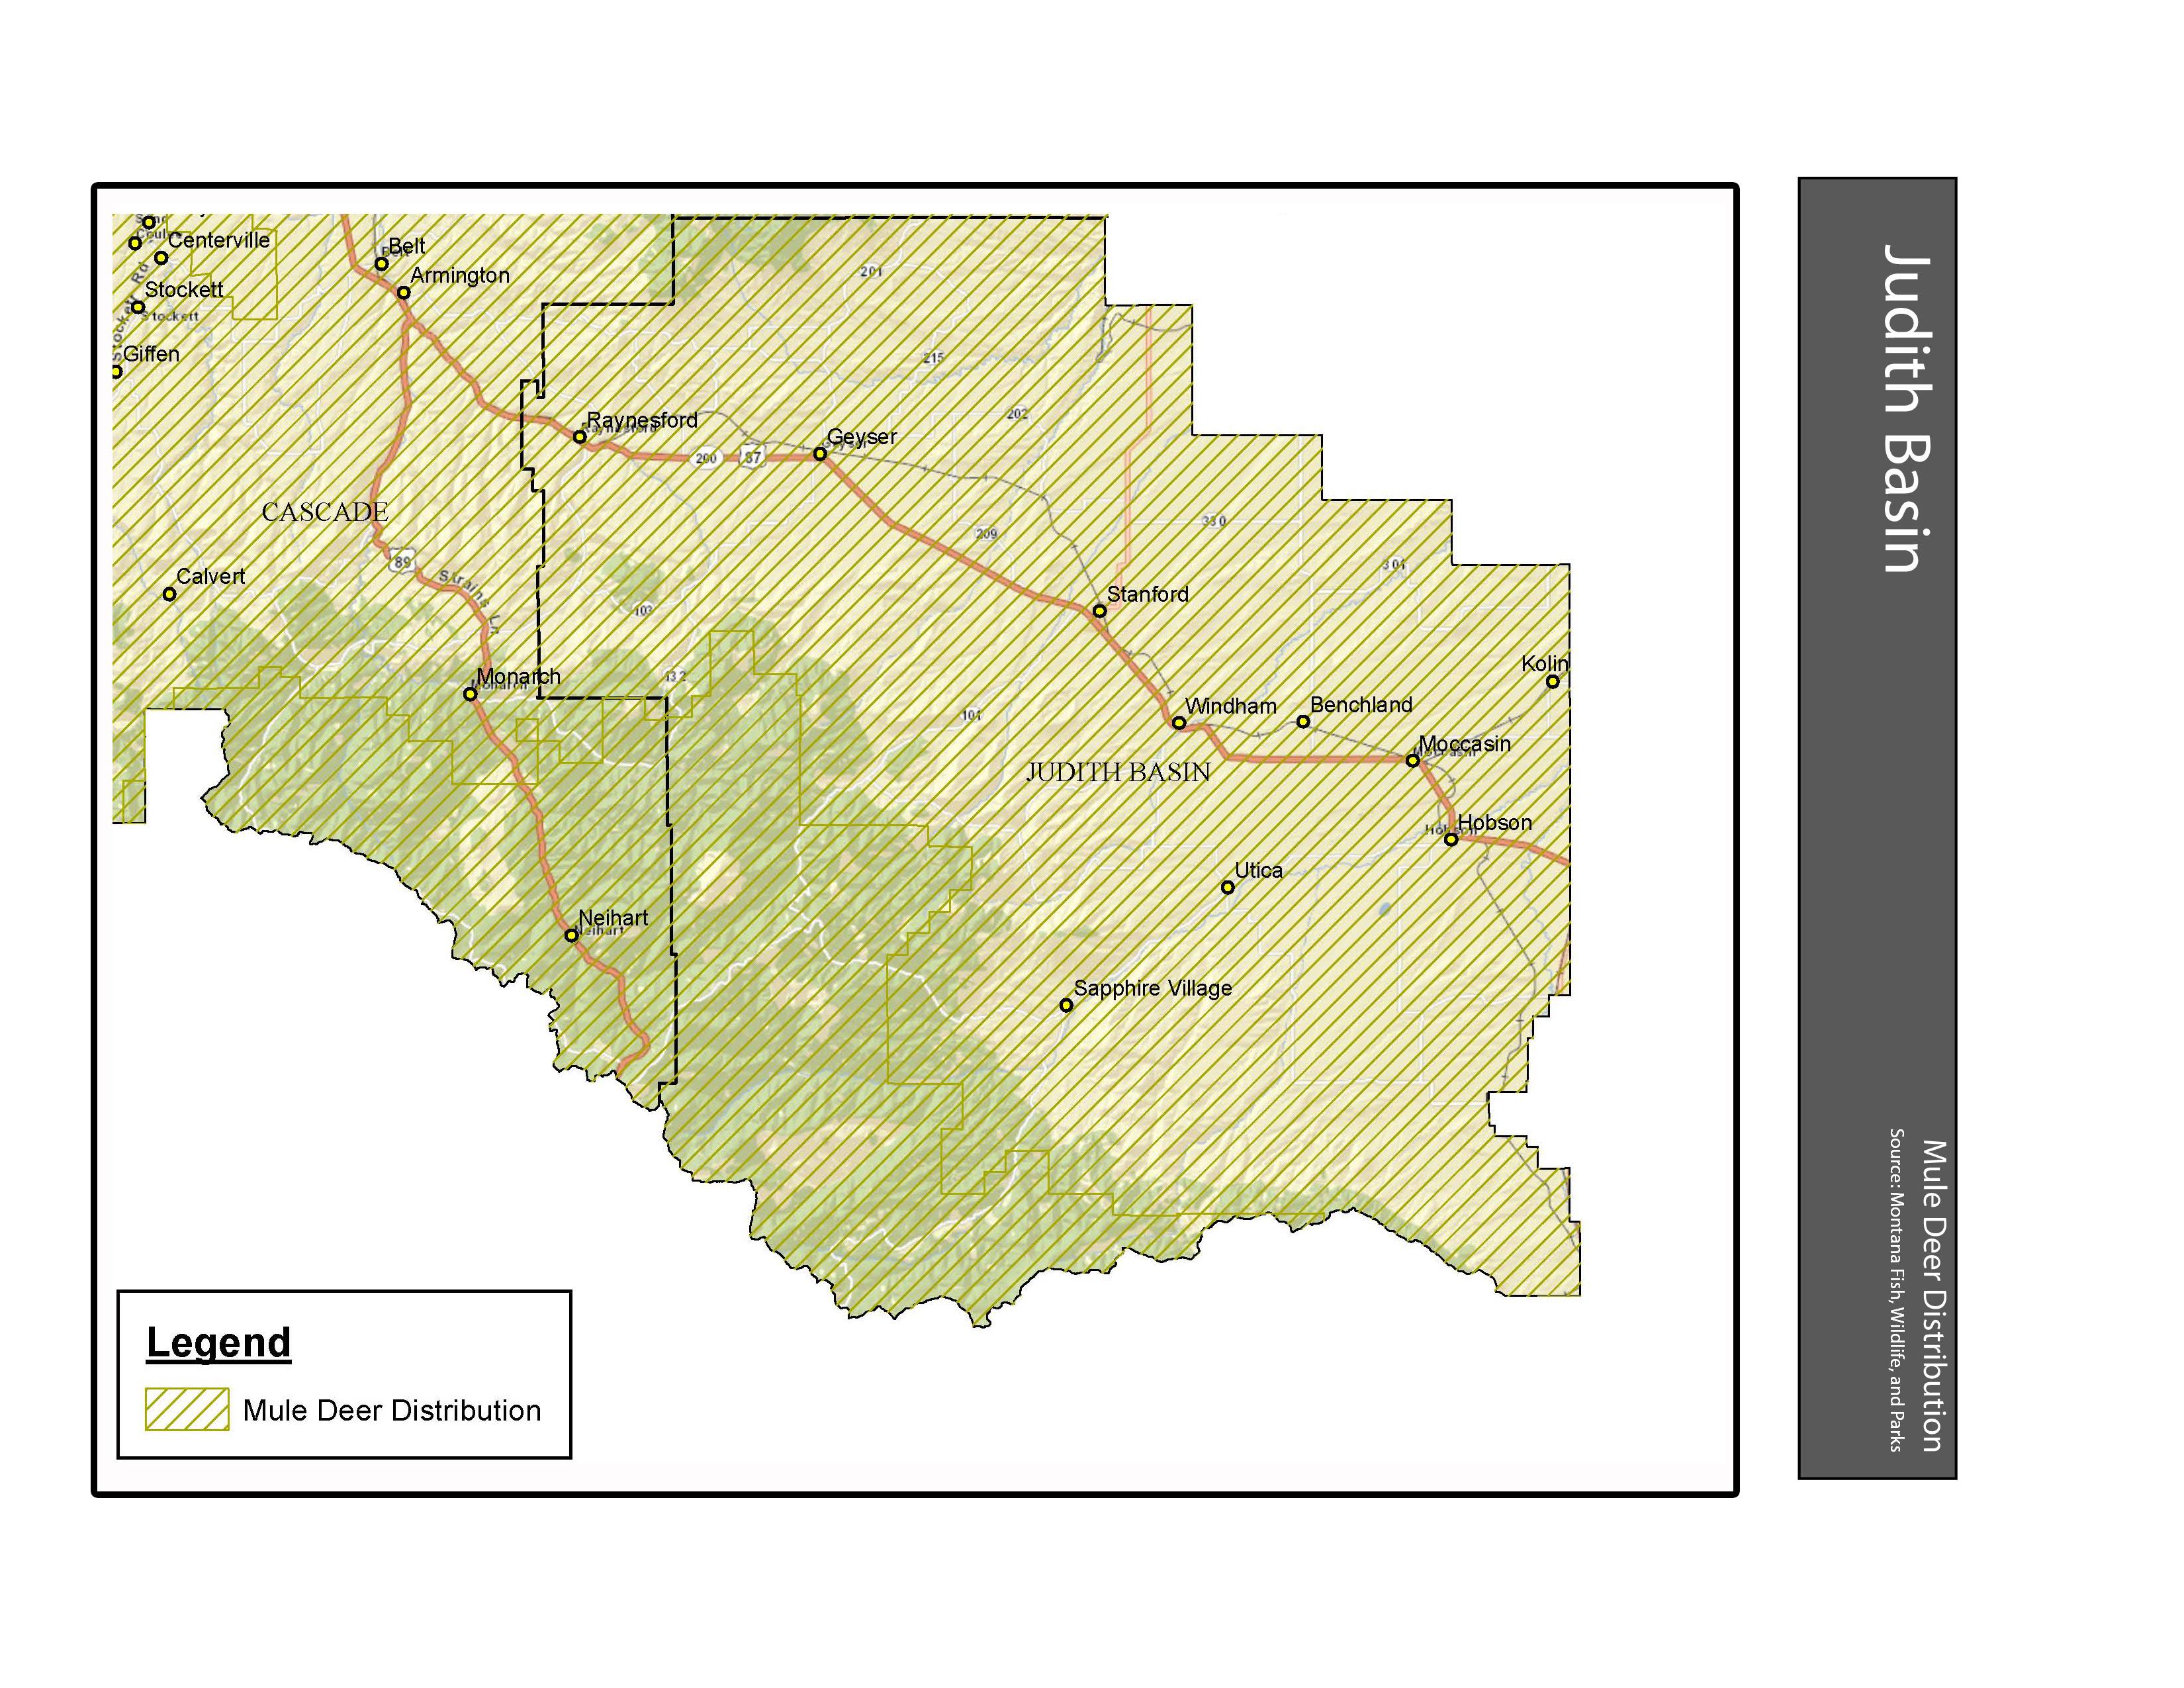 Mule Deer Distribution Judith Basin County